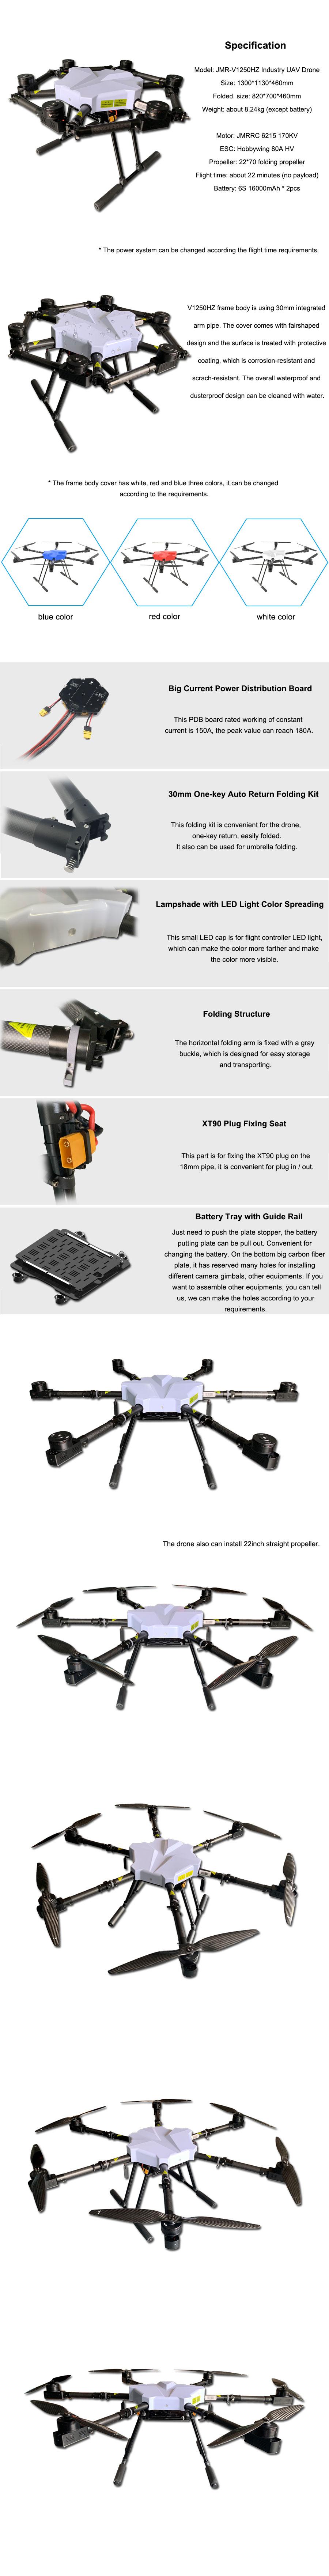 hexacopter drone,uav frame,industrial drone,uav survey,drone survey,fpv for drone,tracker for drone,pito cover,fpv drone,drones,drones thermal,